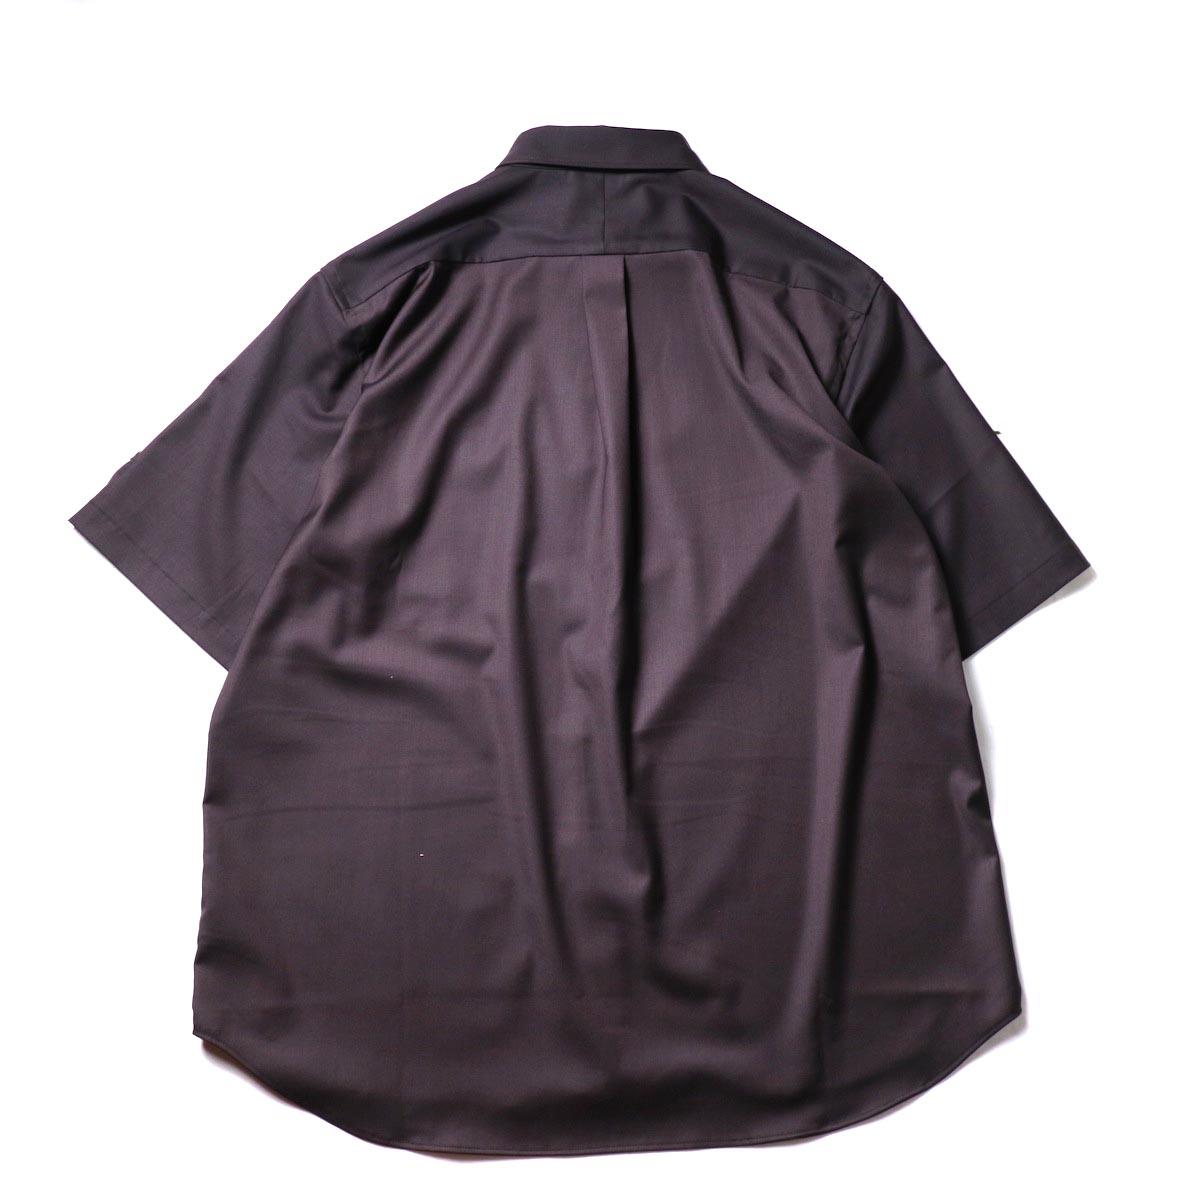 alvana / Wrinkle Proof Shirts (Charcoal)背面